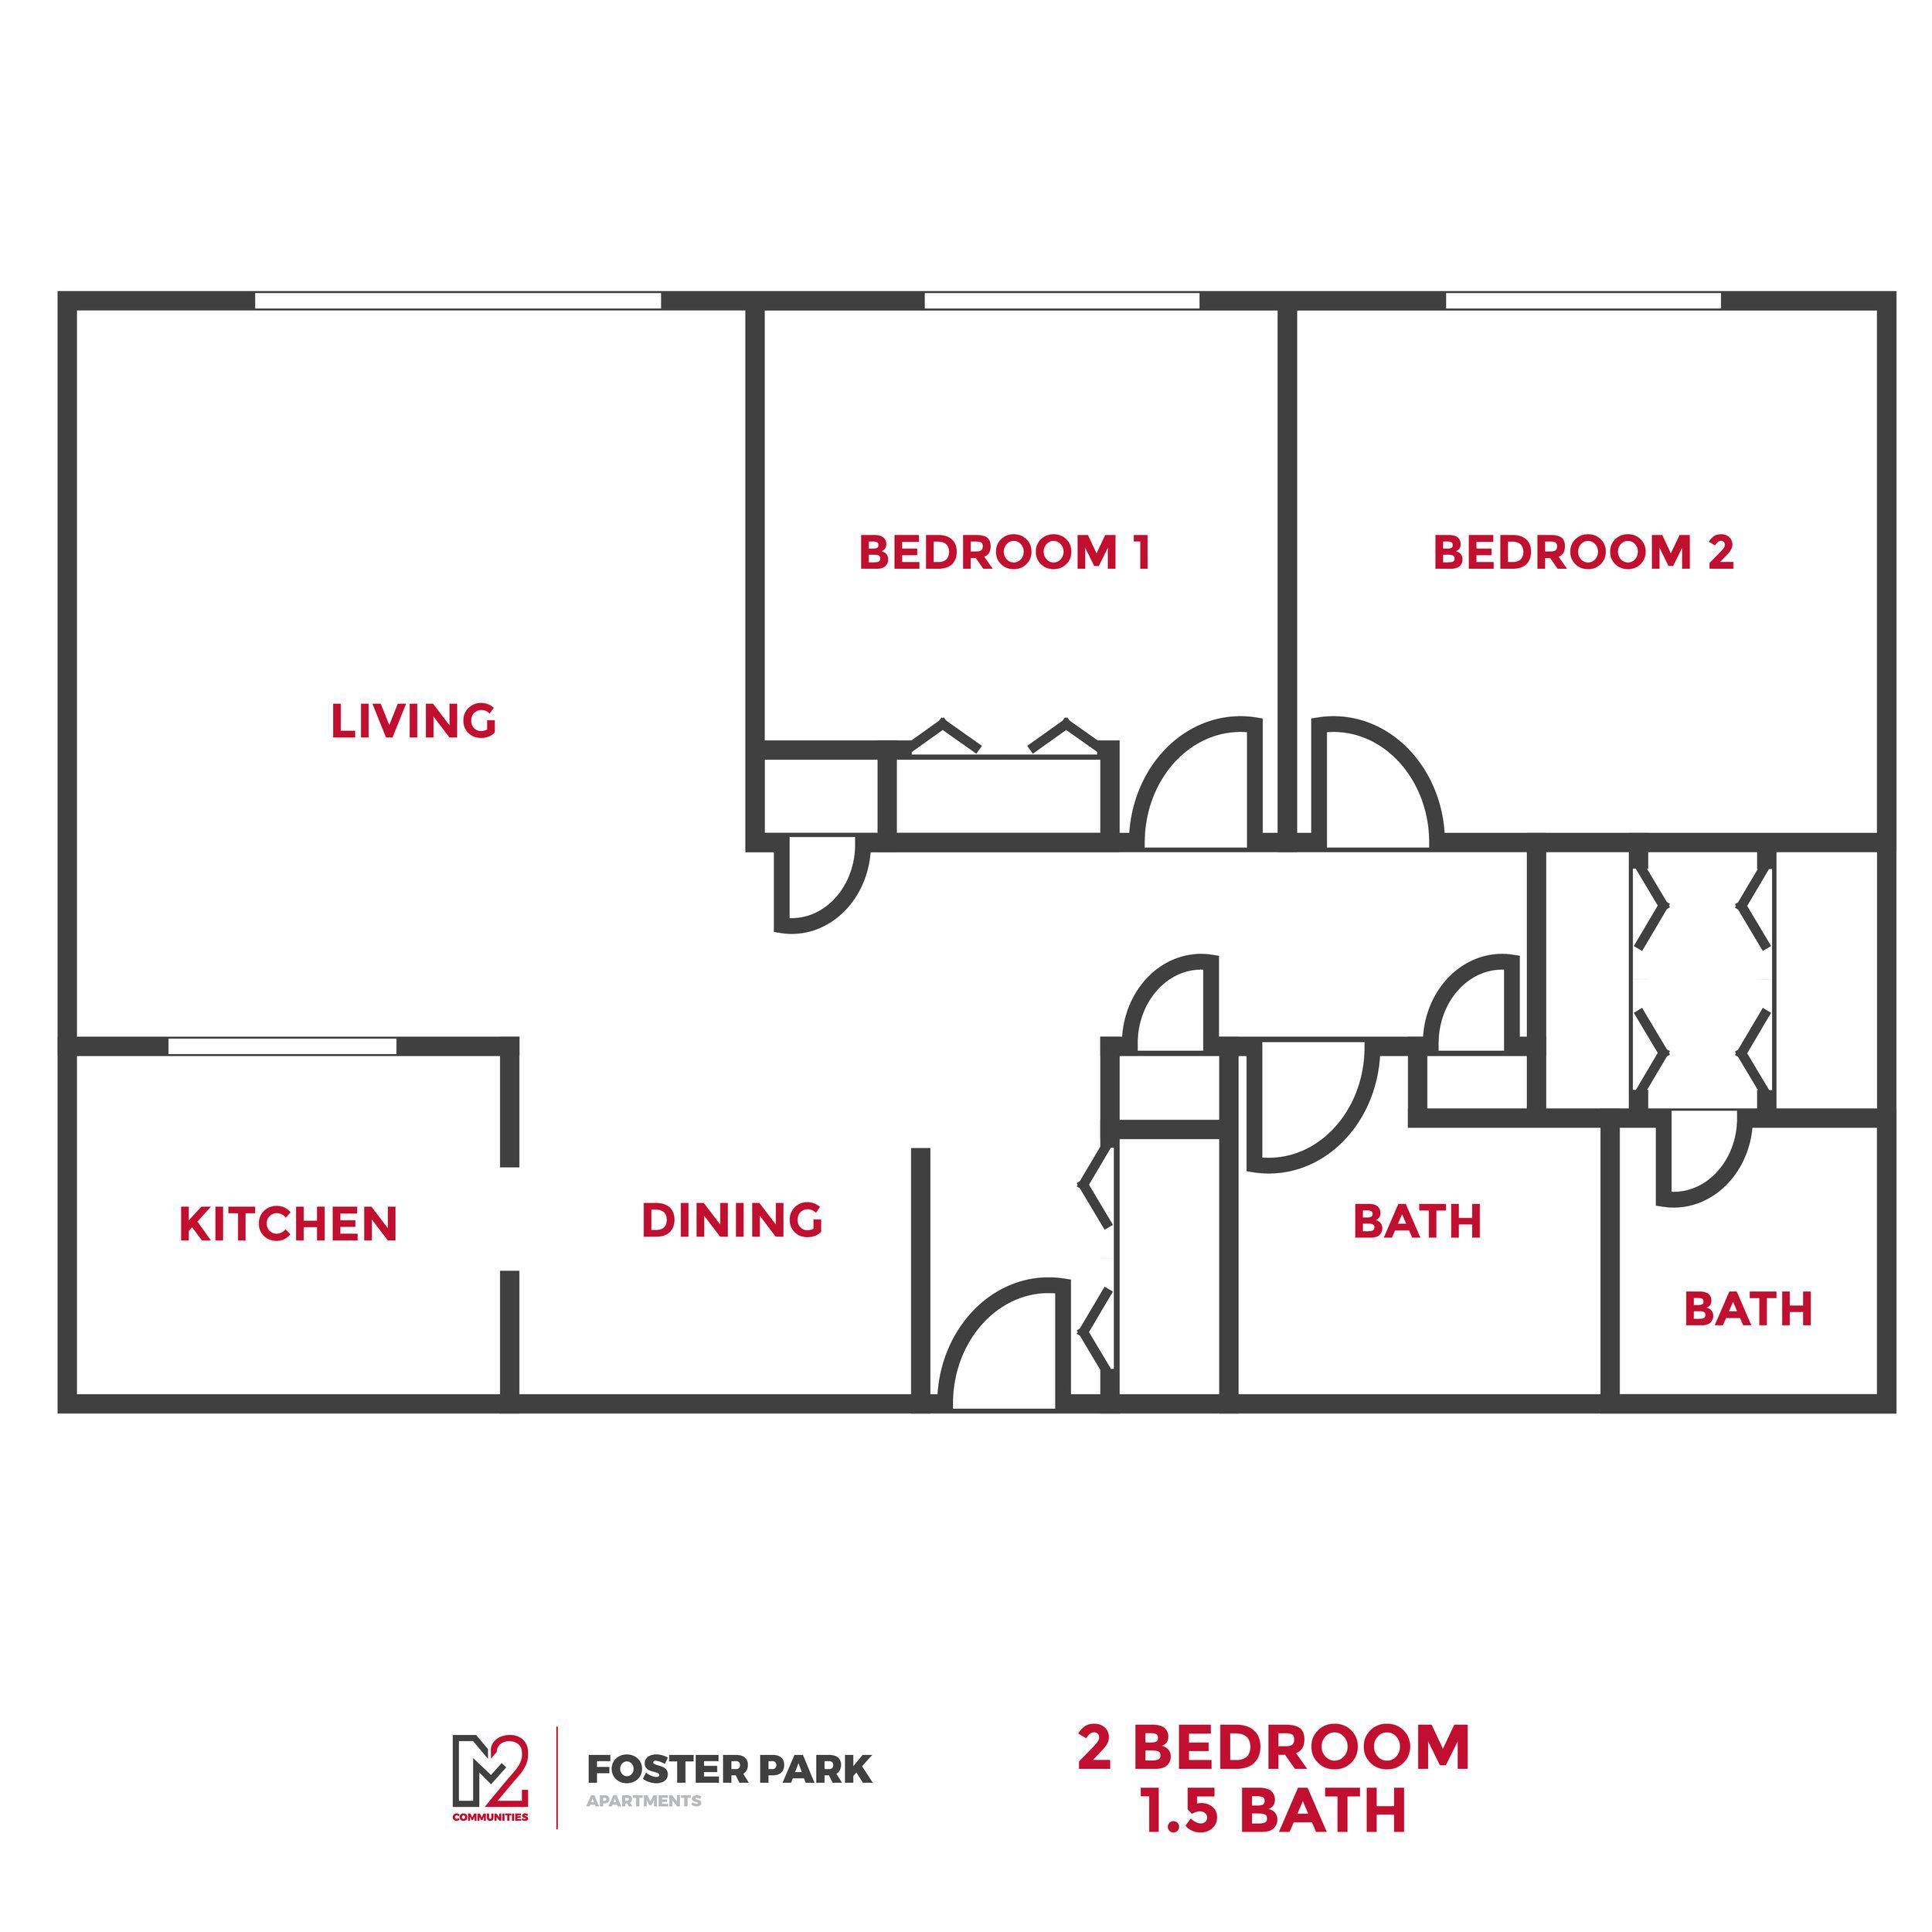 M2_Foster_Floorplans-19.jpg